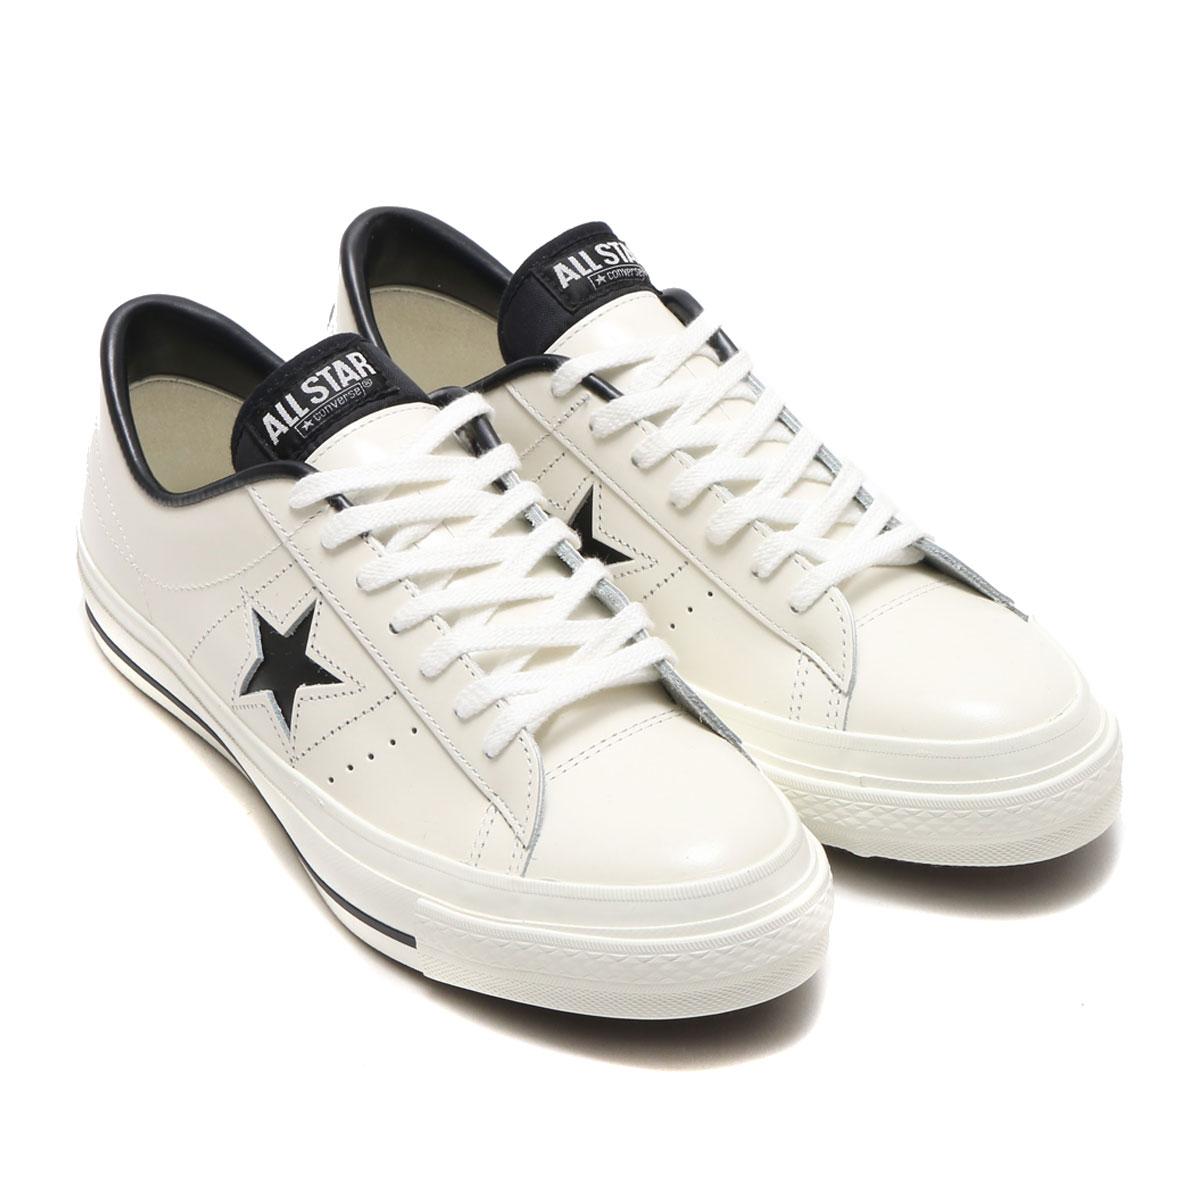 CONVERSE ONE STAR J(コンバース ワン スター J) ホワイト/ブラック【メンズ レディース スニーカー】17FW-I